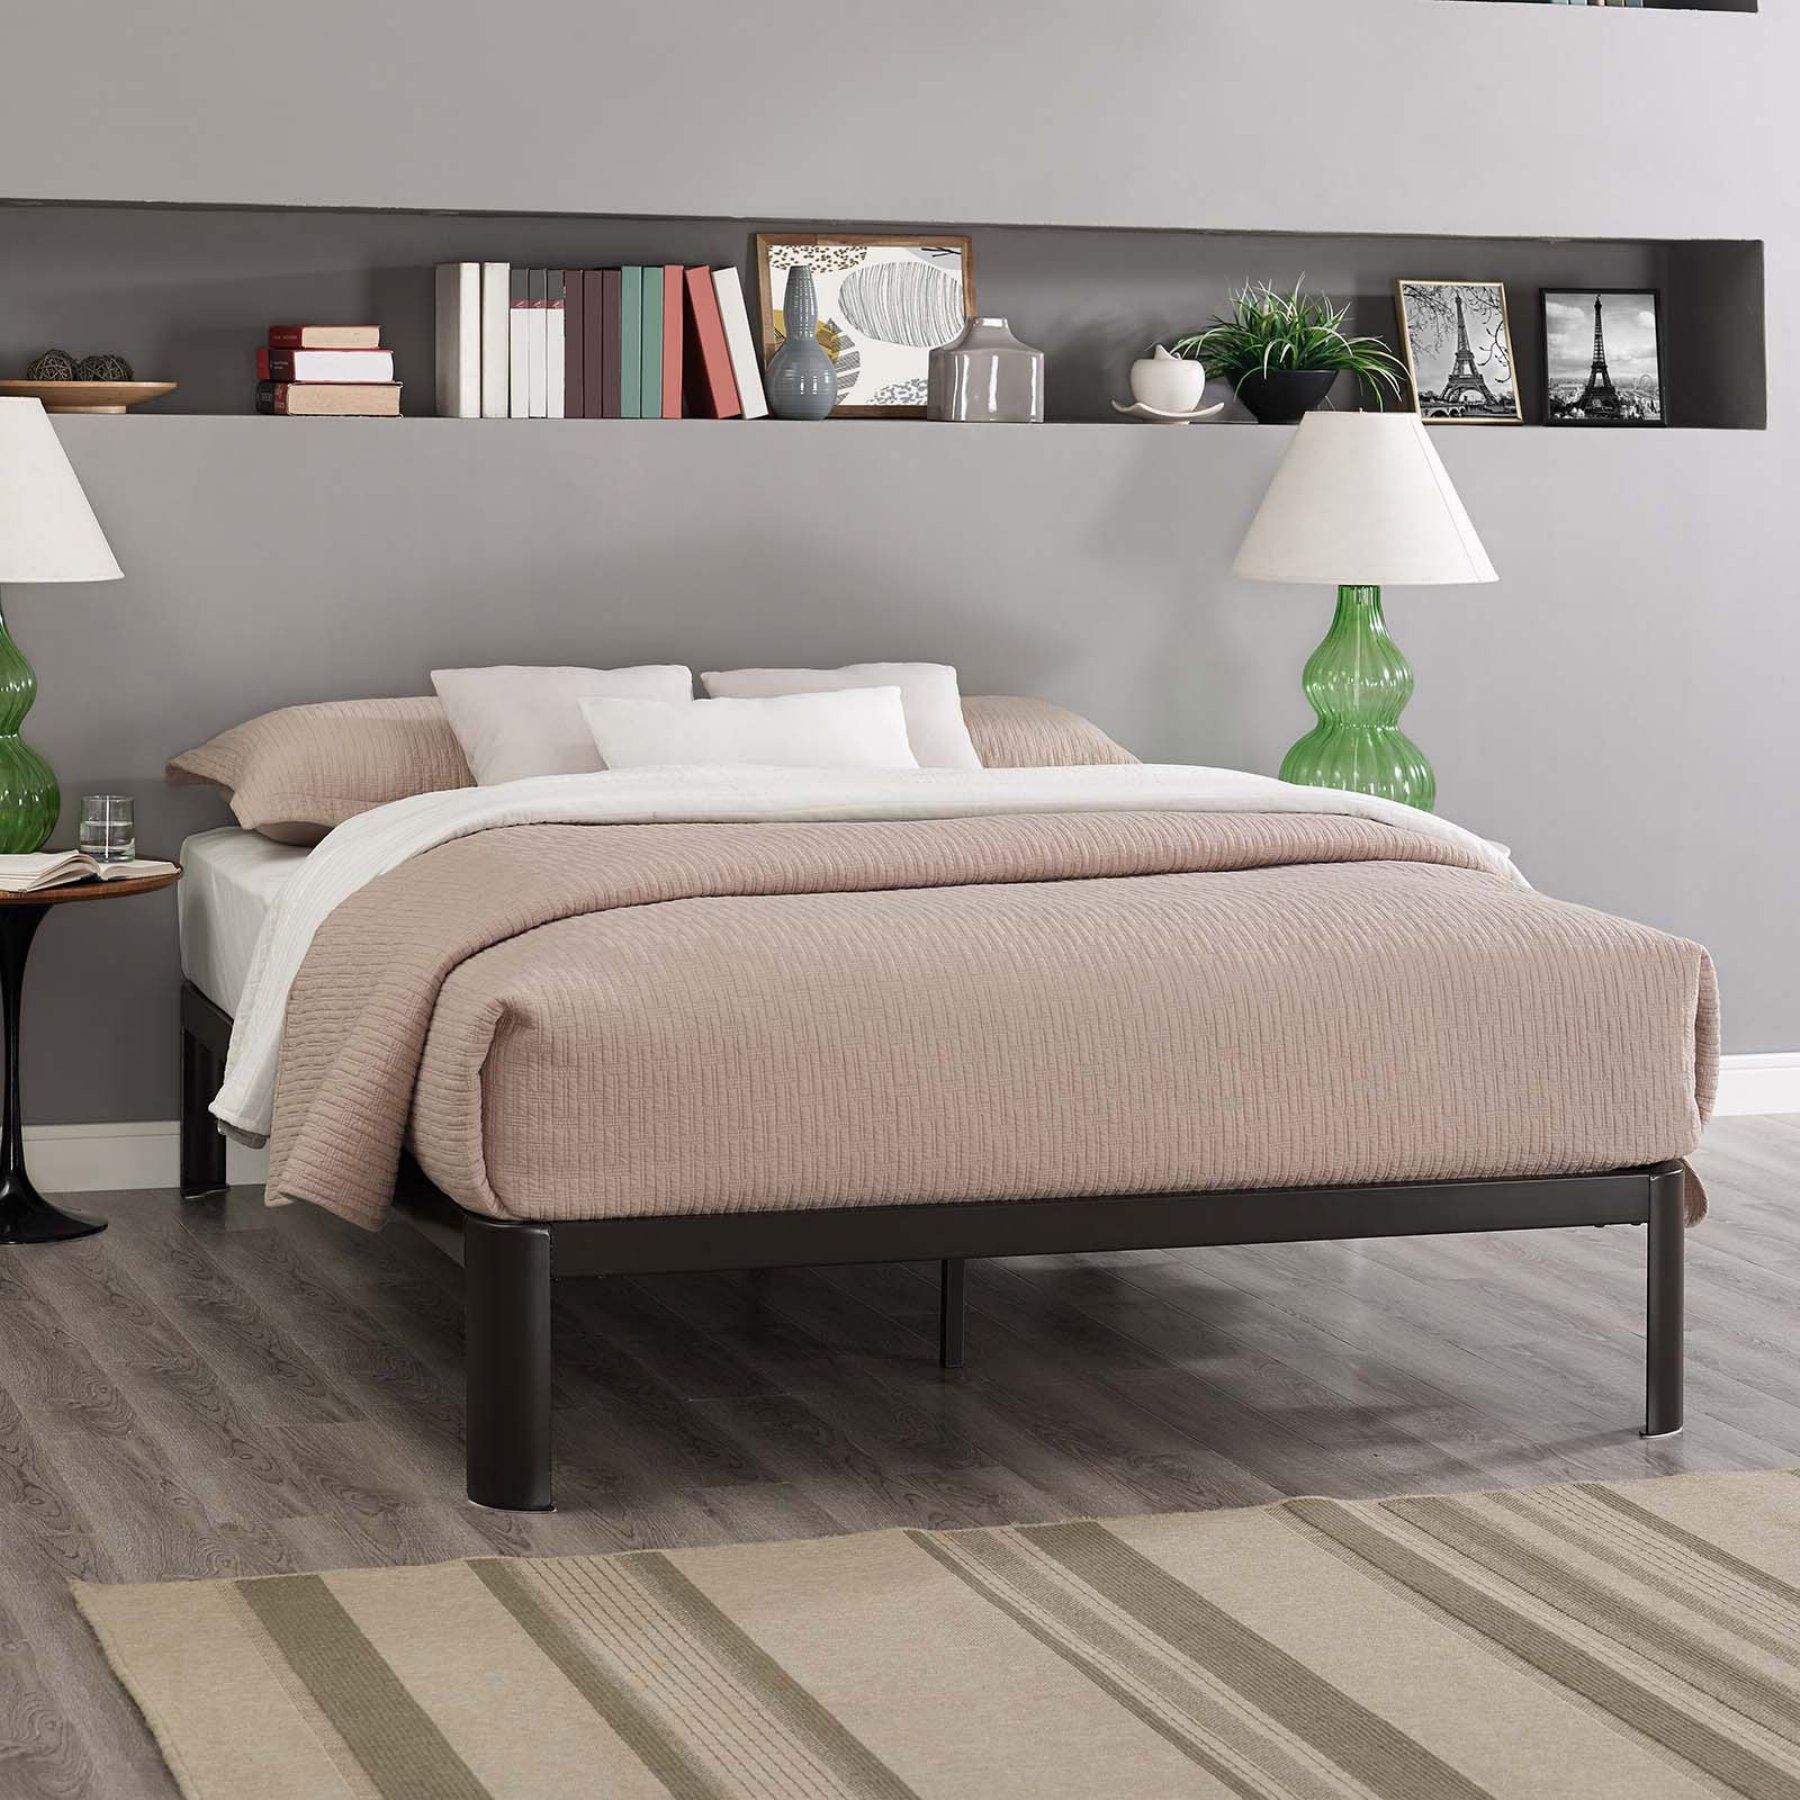 Modway Corinne Platform Bed Frame - MOD-5468-BRN | Products by ...